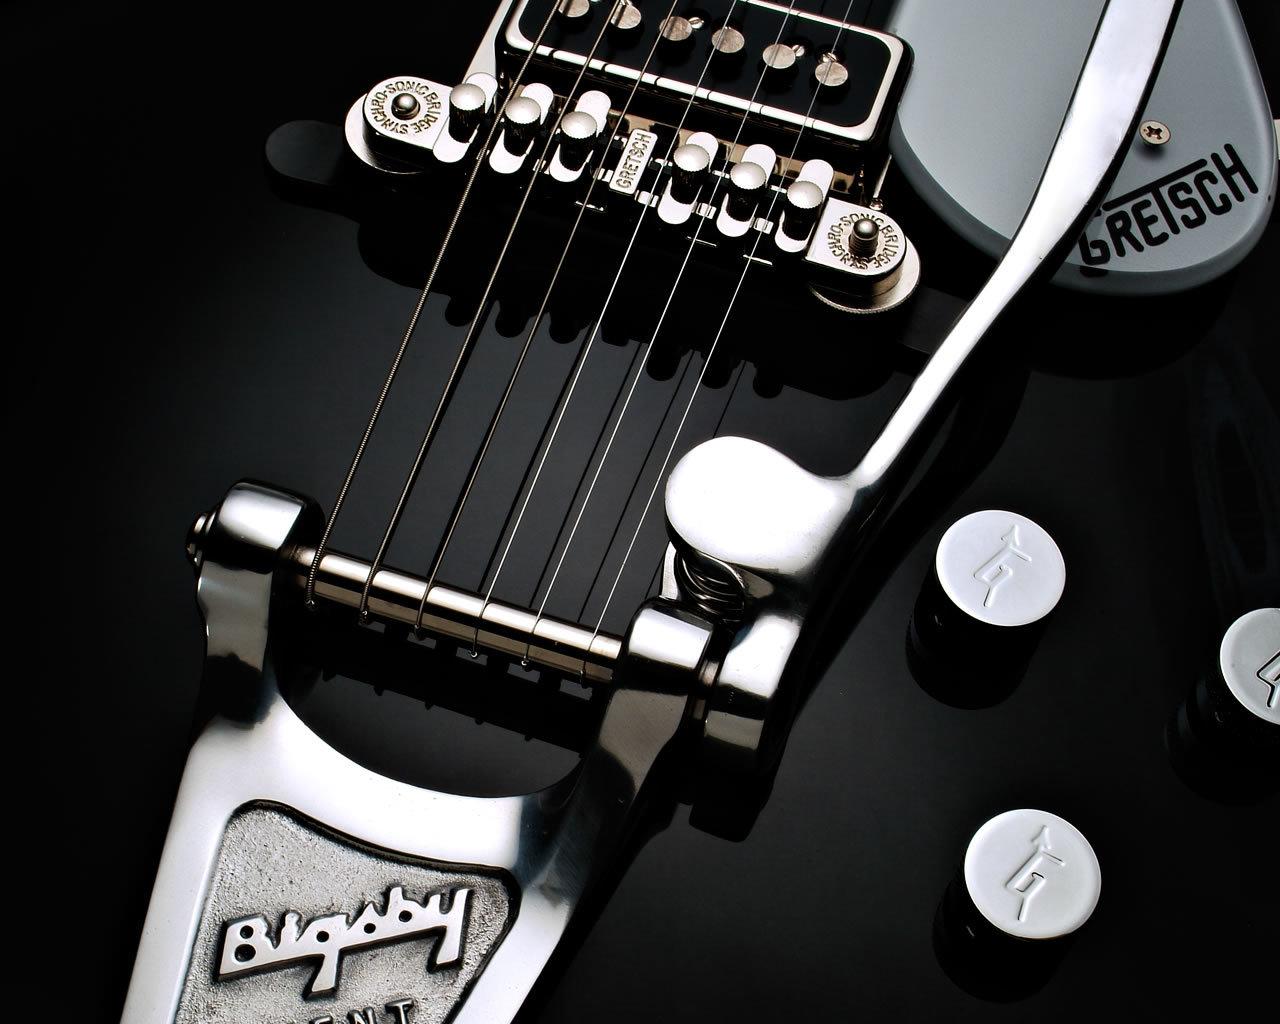 Download hd 1280x1024 guitar desktop wallpaper id249243 for free voltagebd Choice Image